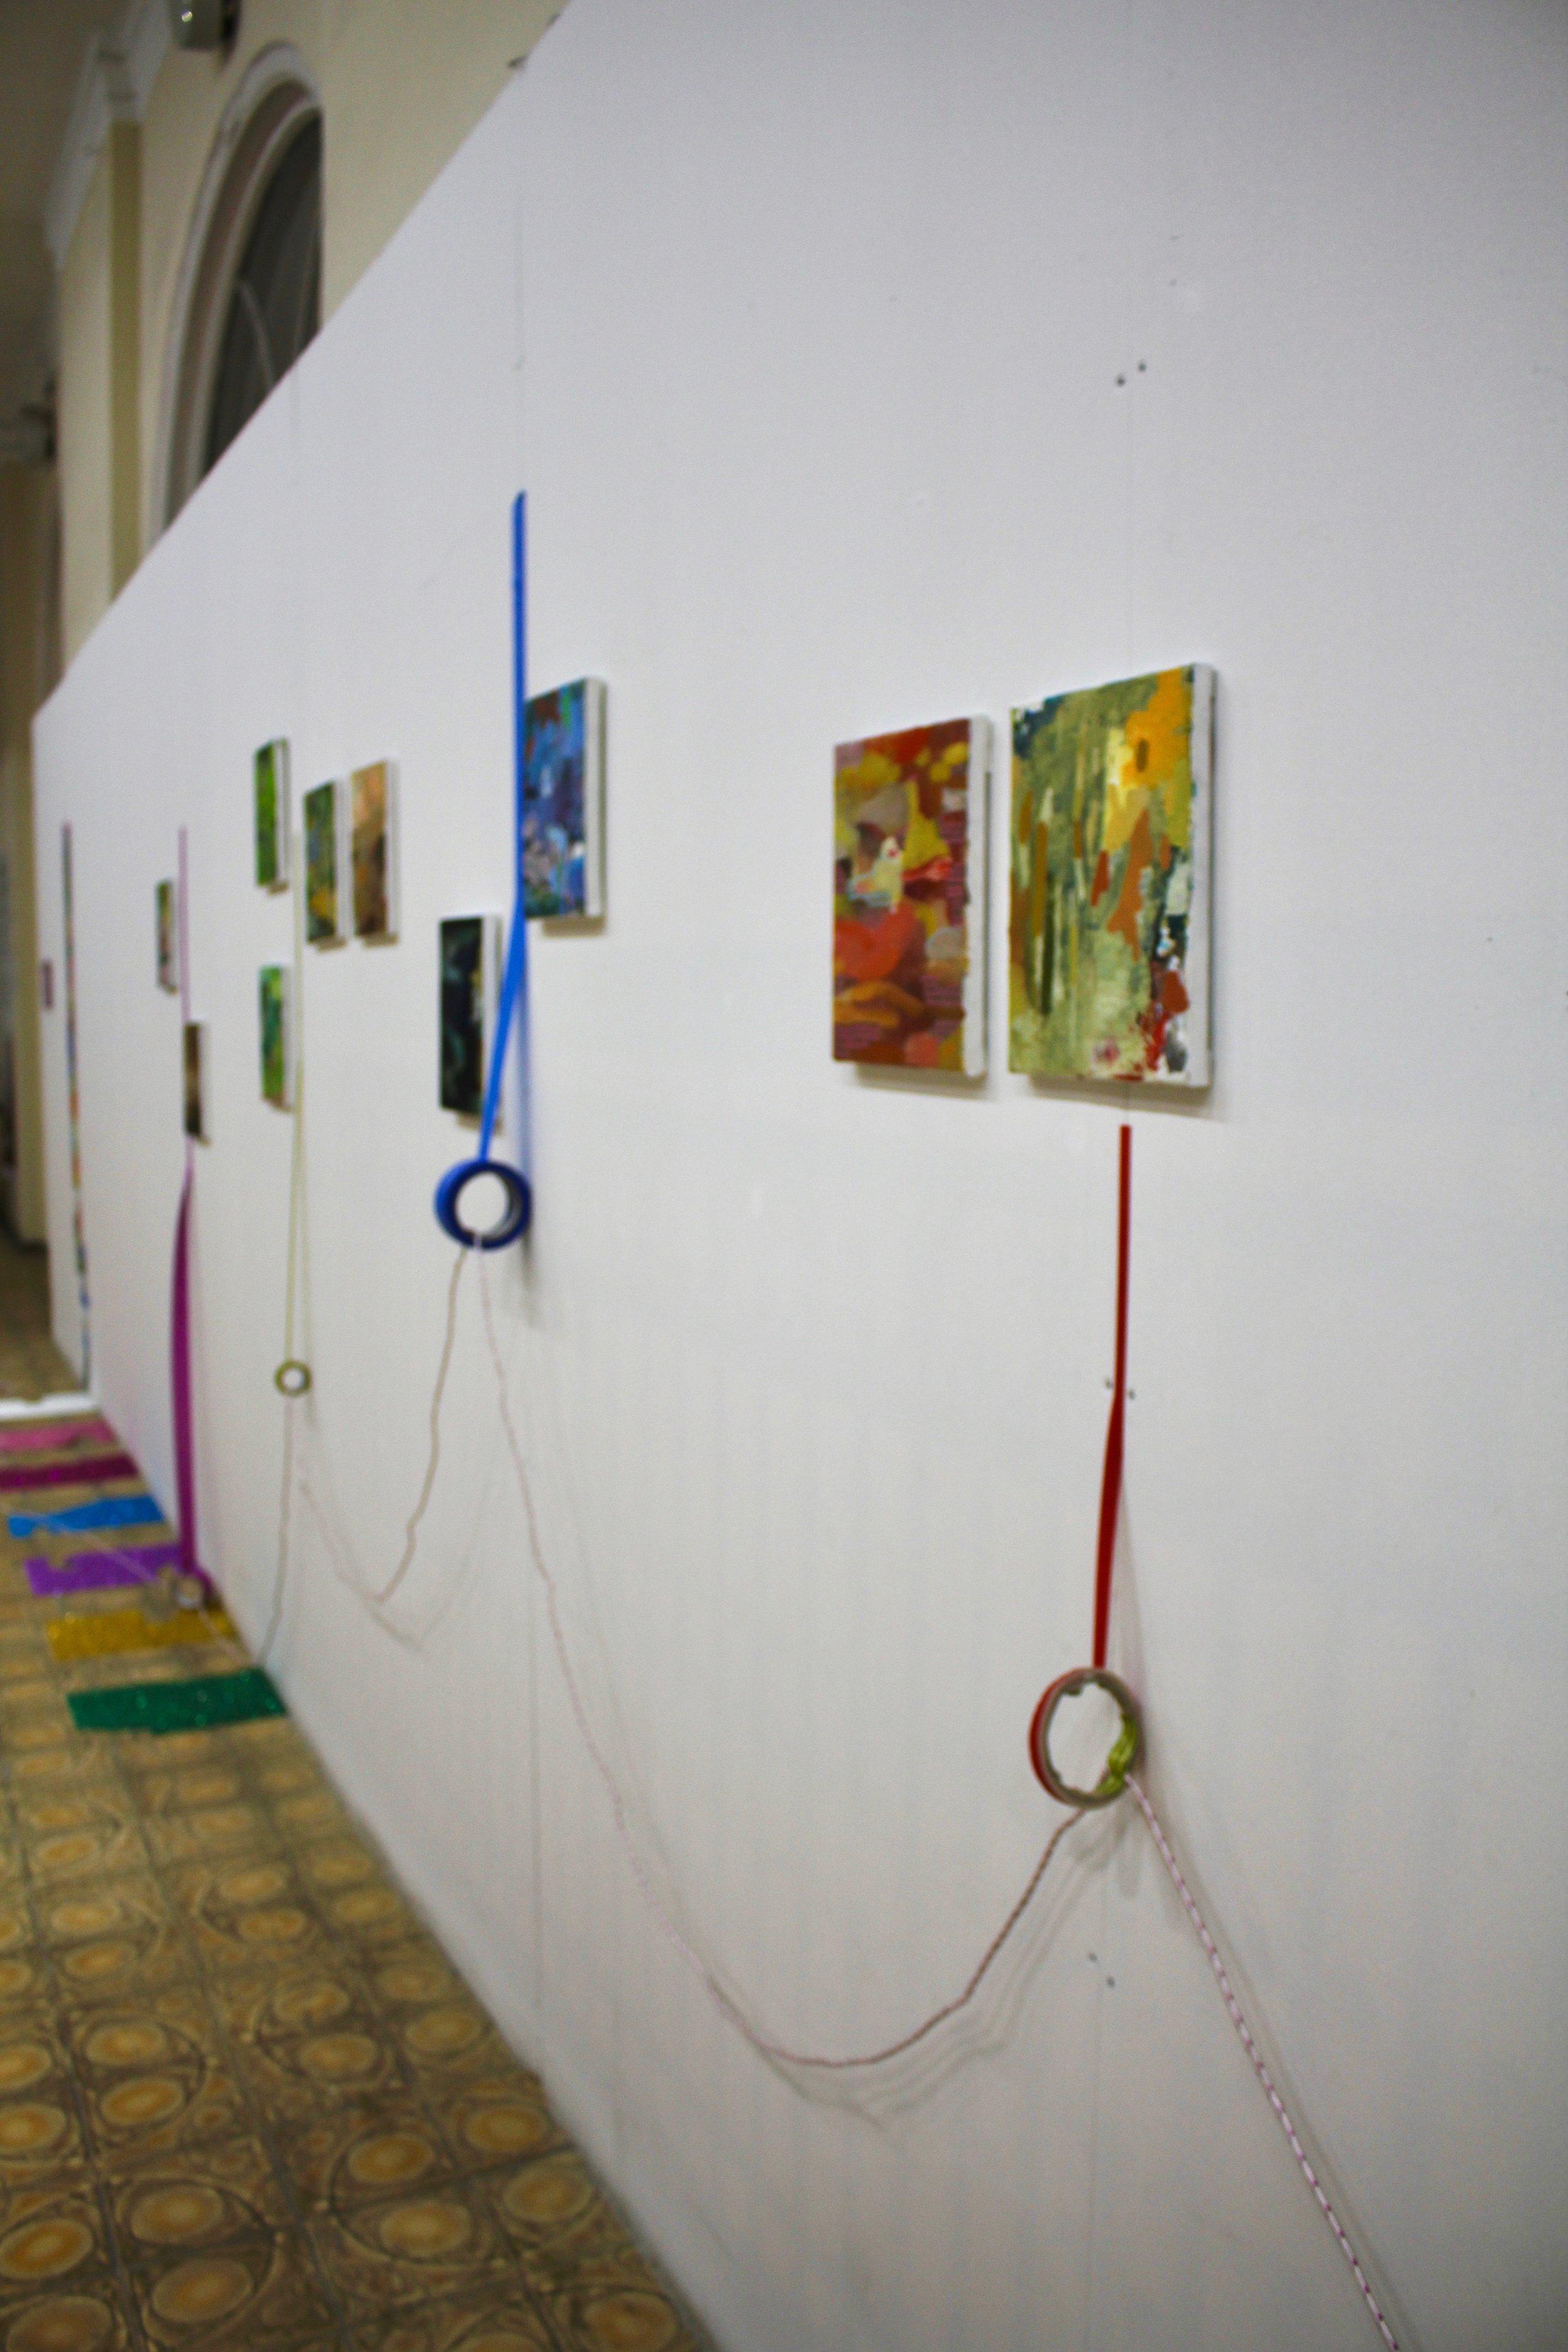 Scissor Language Installation, Karvasla Museum, Tbilisi, Georgia, November 2017